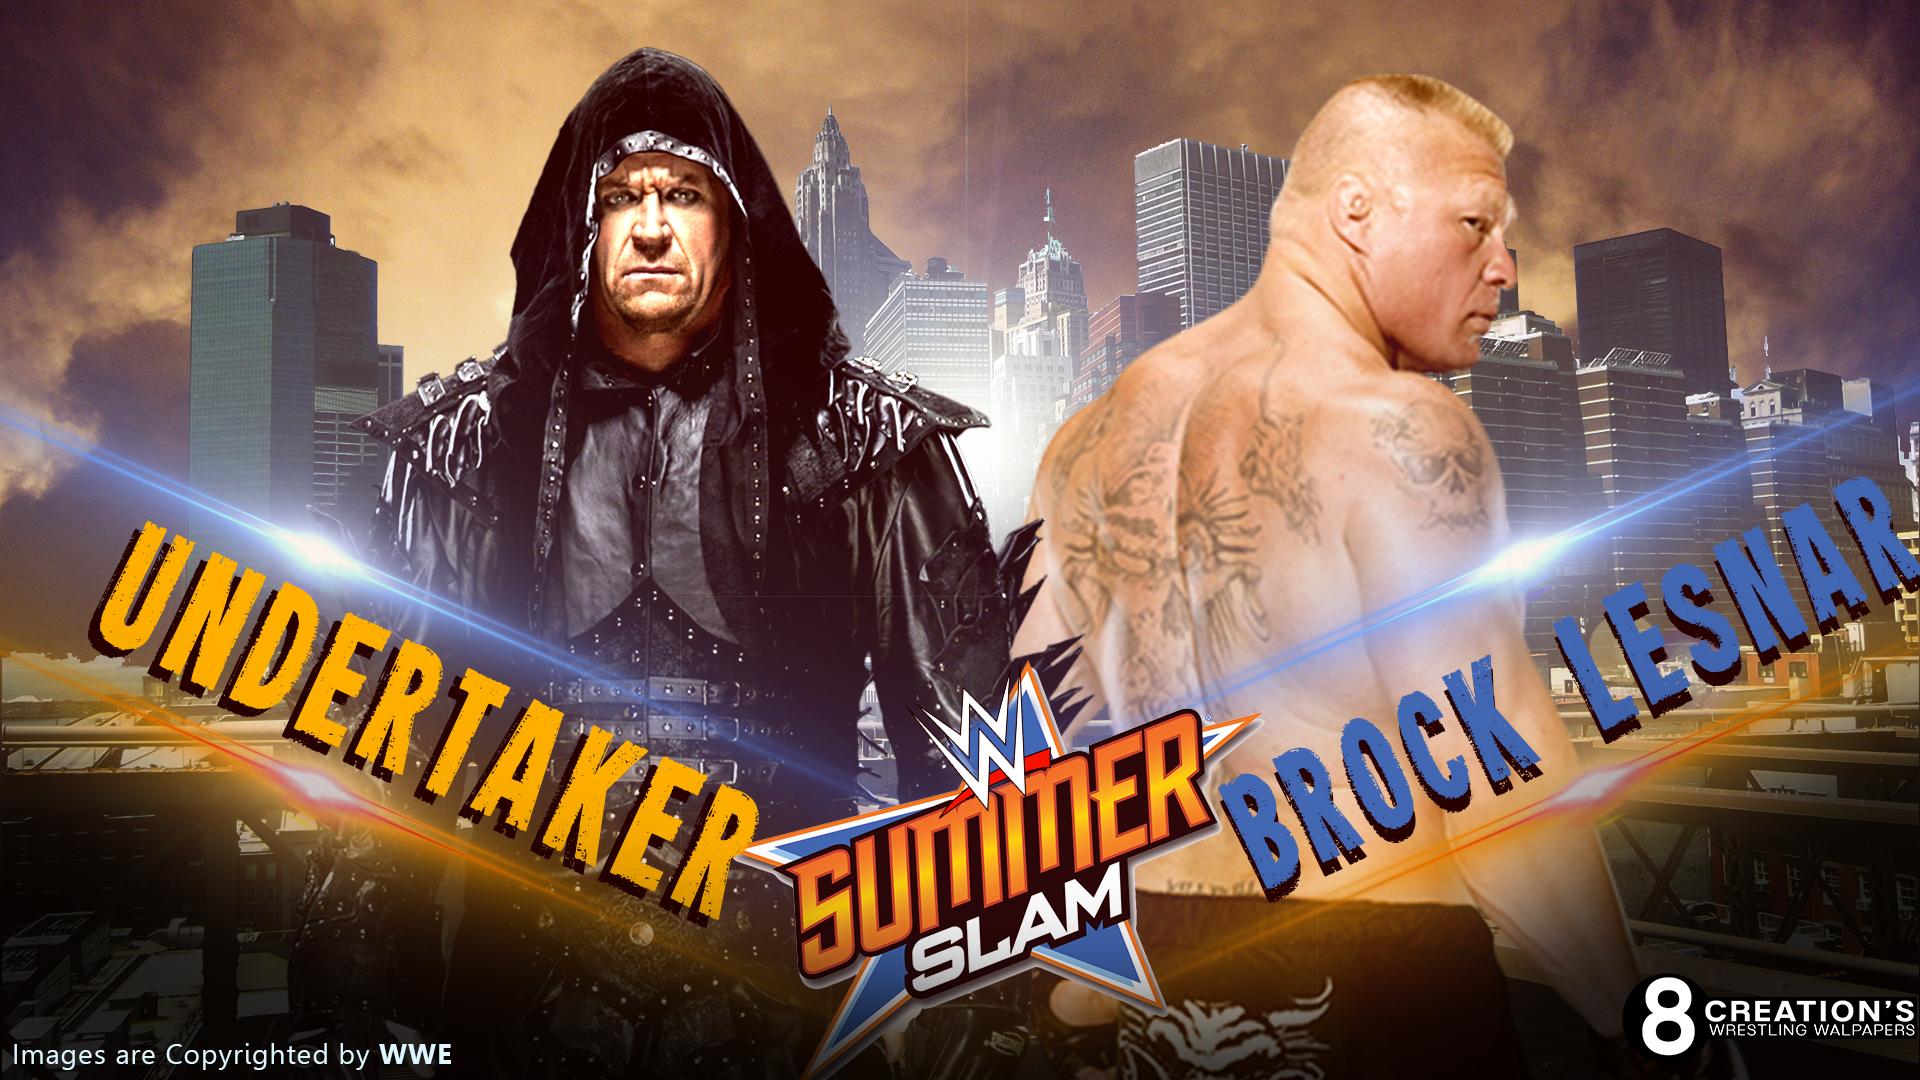 Undertaker Vs Brock Lesnar By Arunraj1791